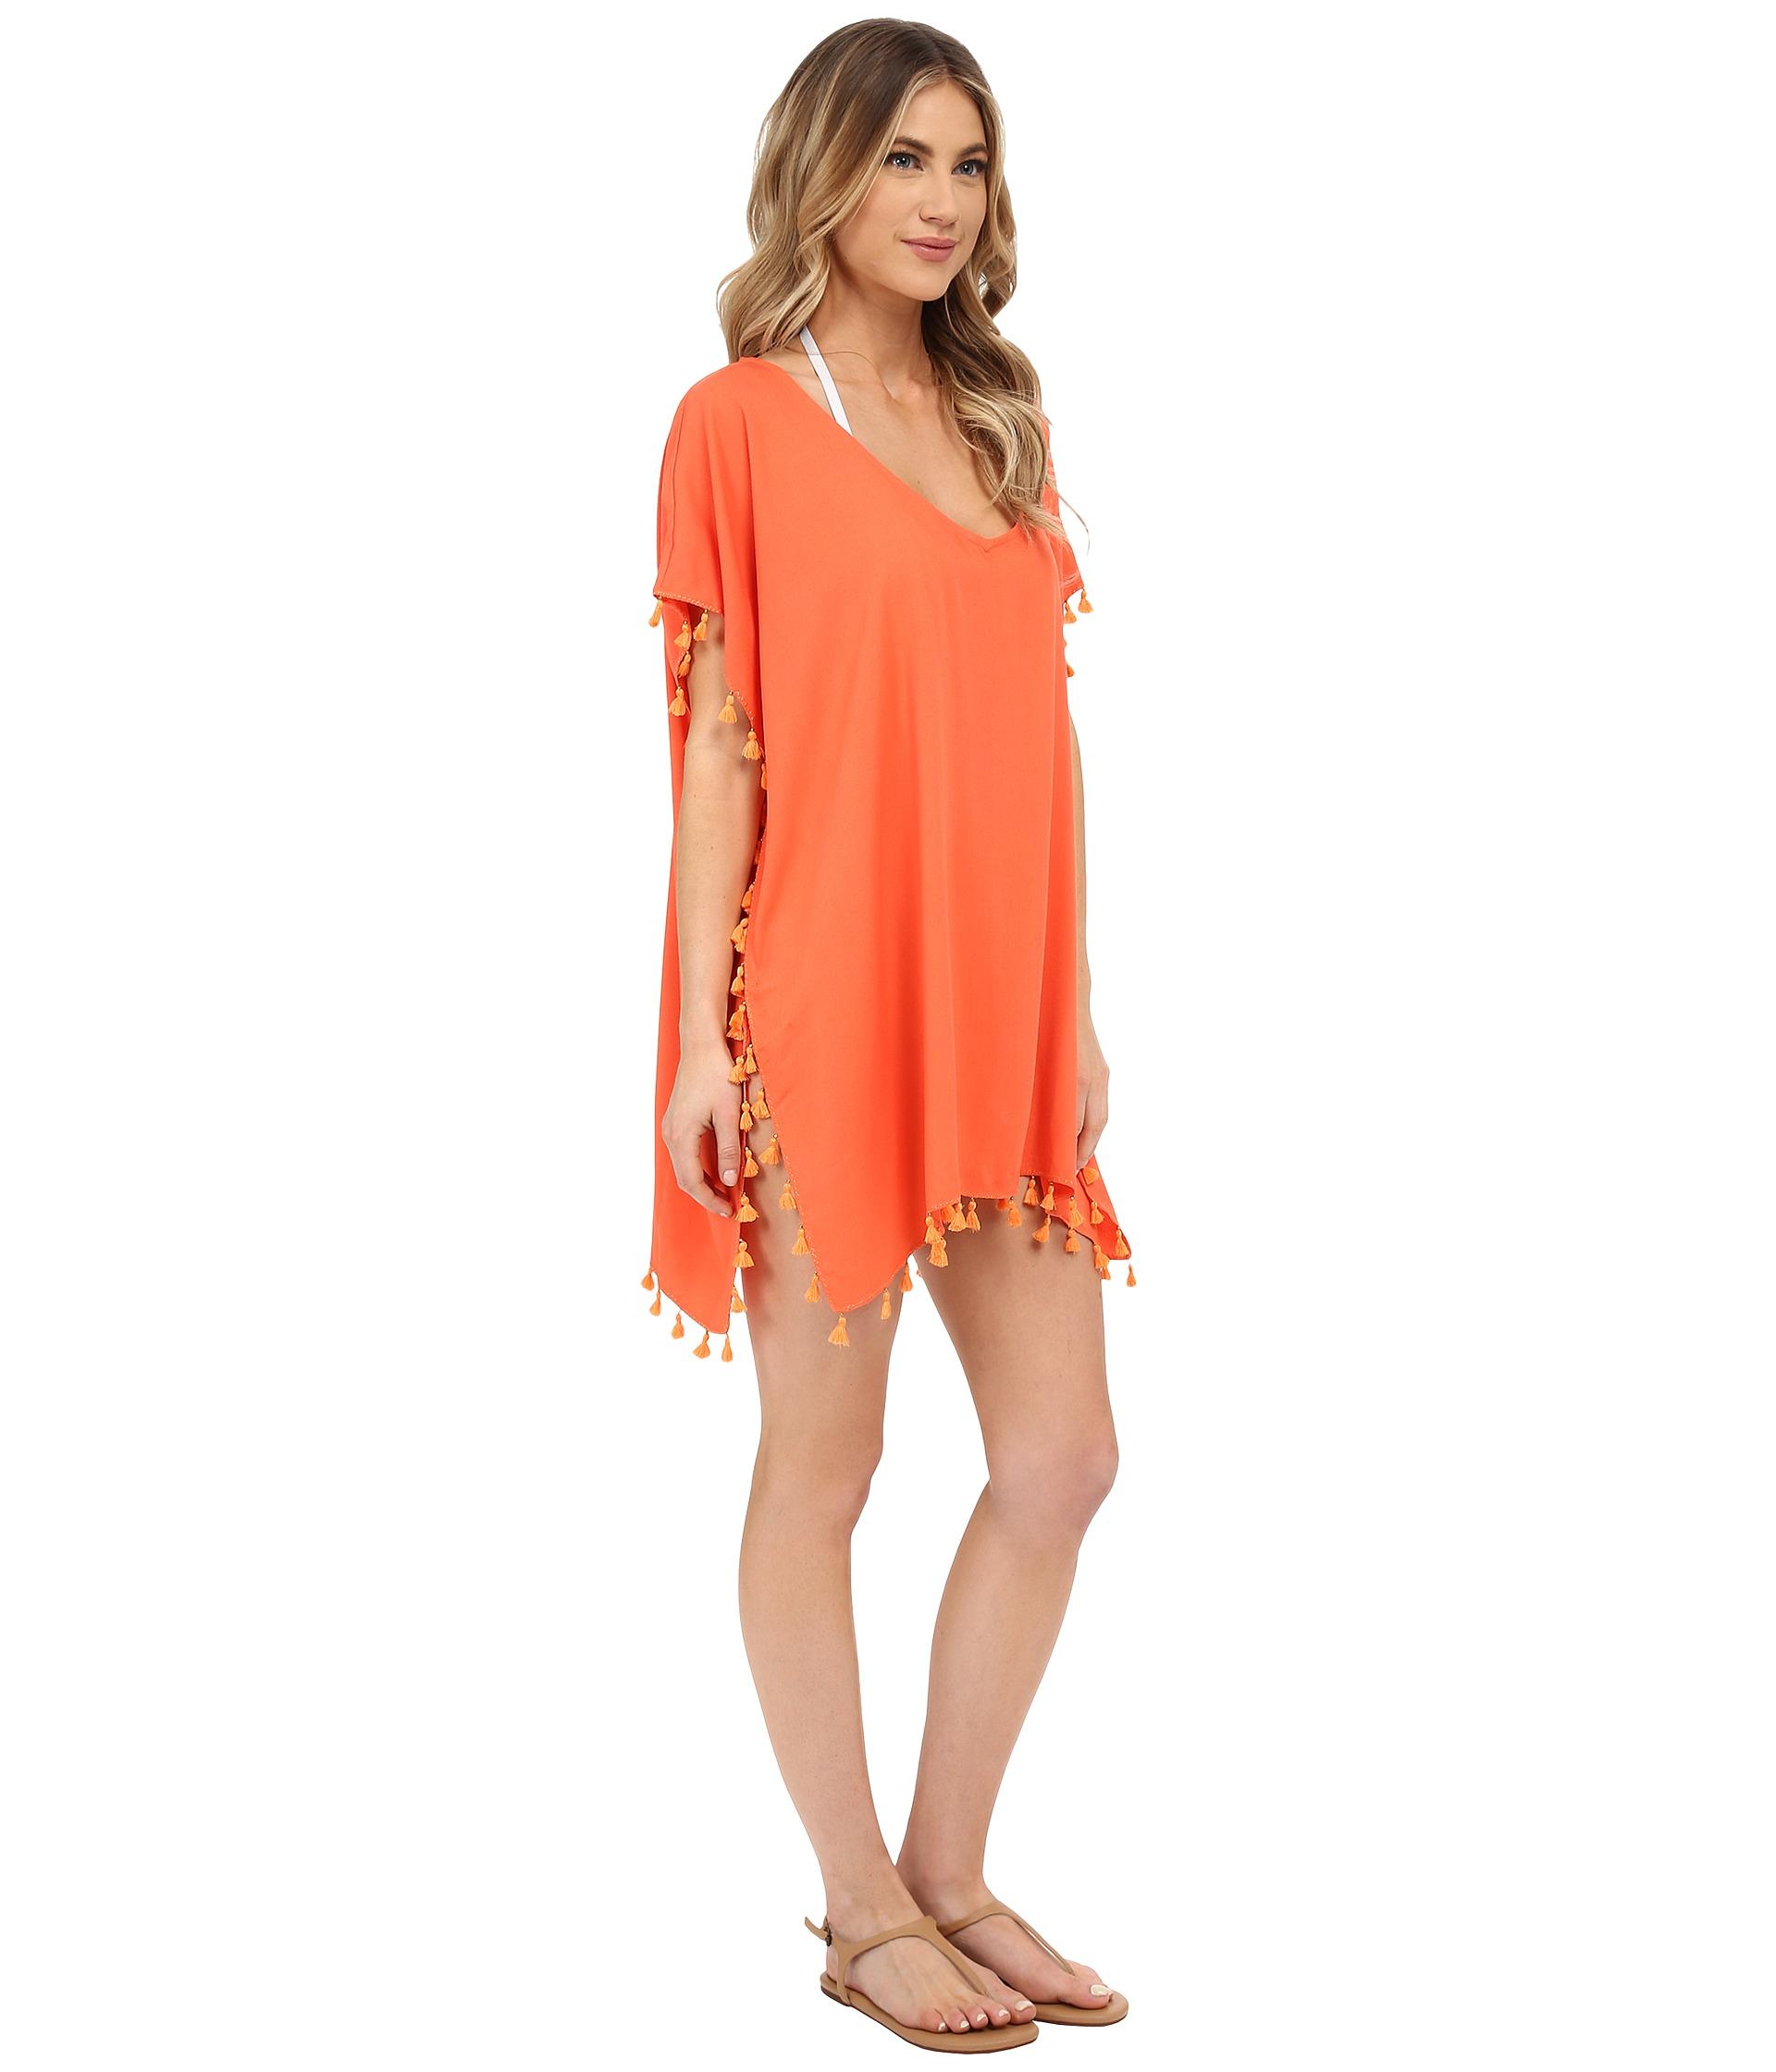 e44089728d27a Lyst - Seafolly Bling Beach Kaftan Cover-up in Orange